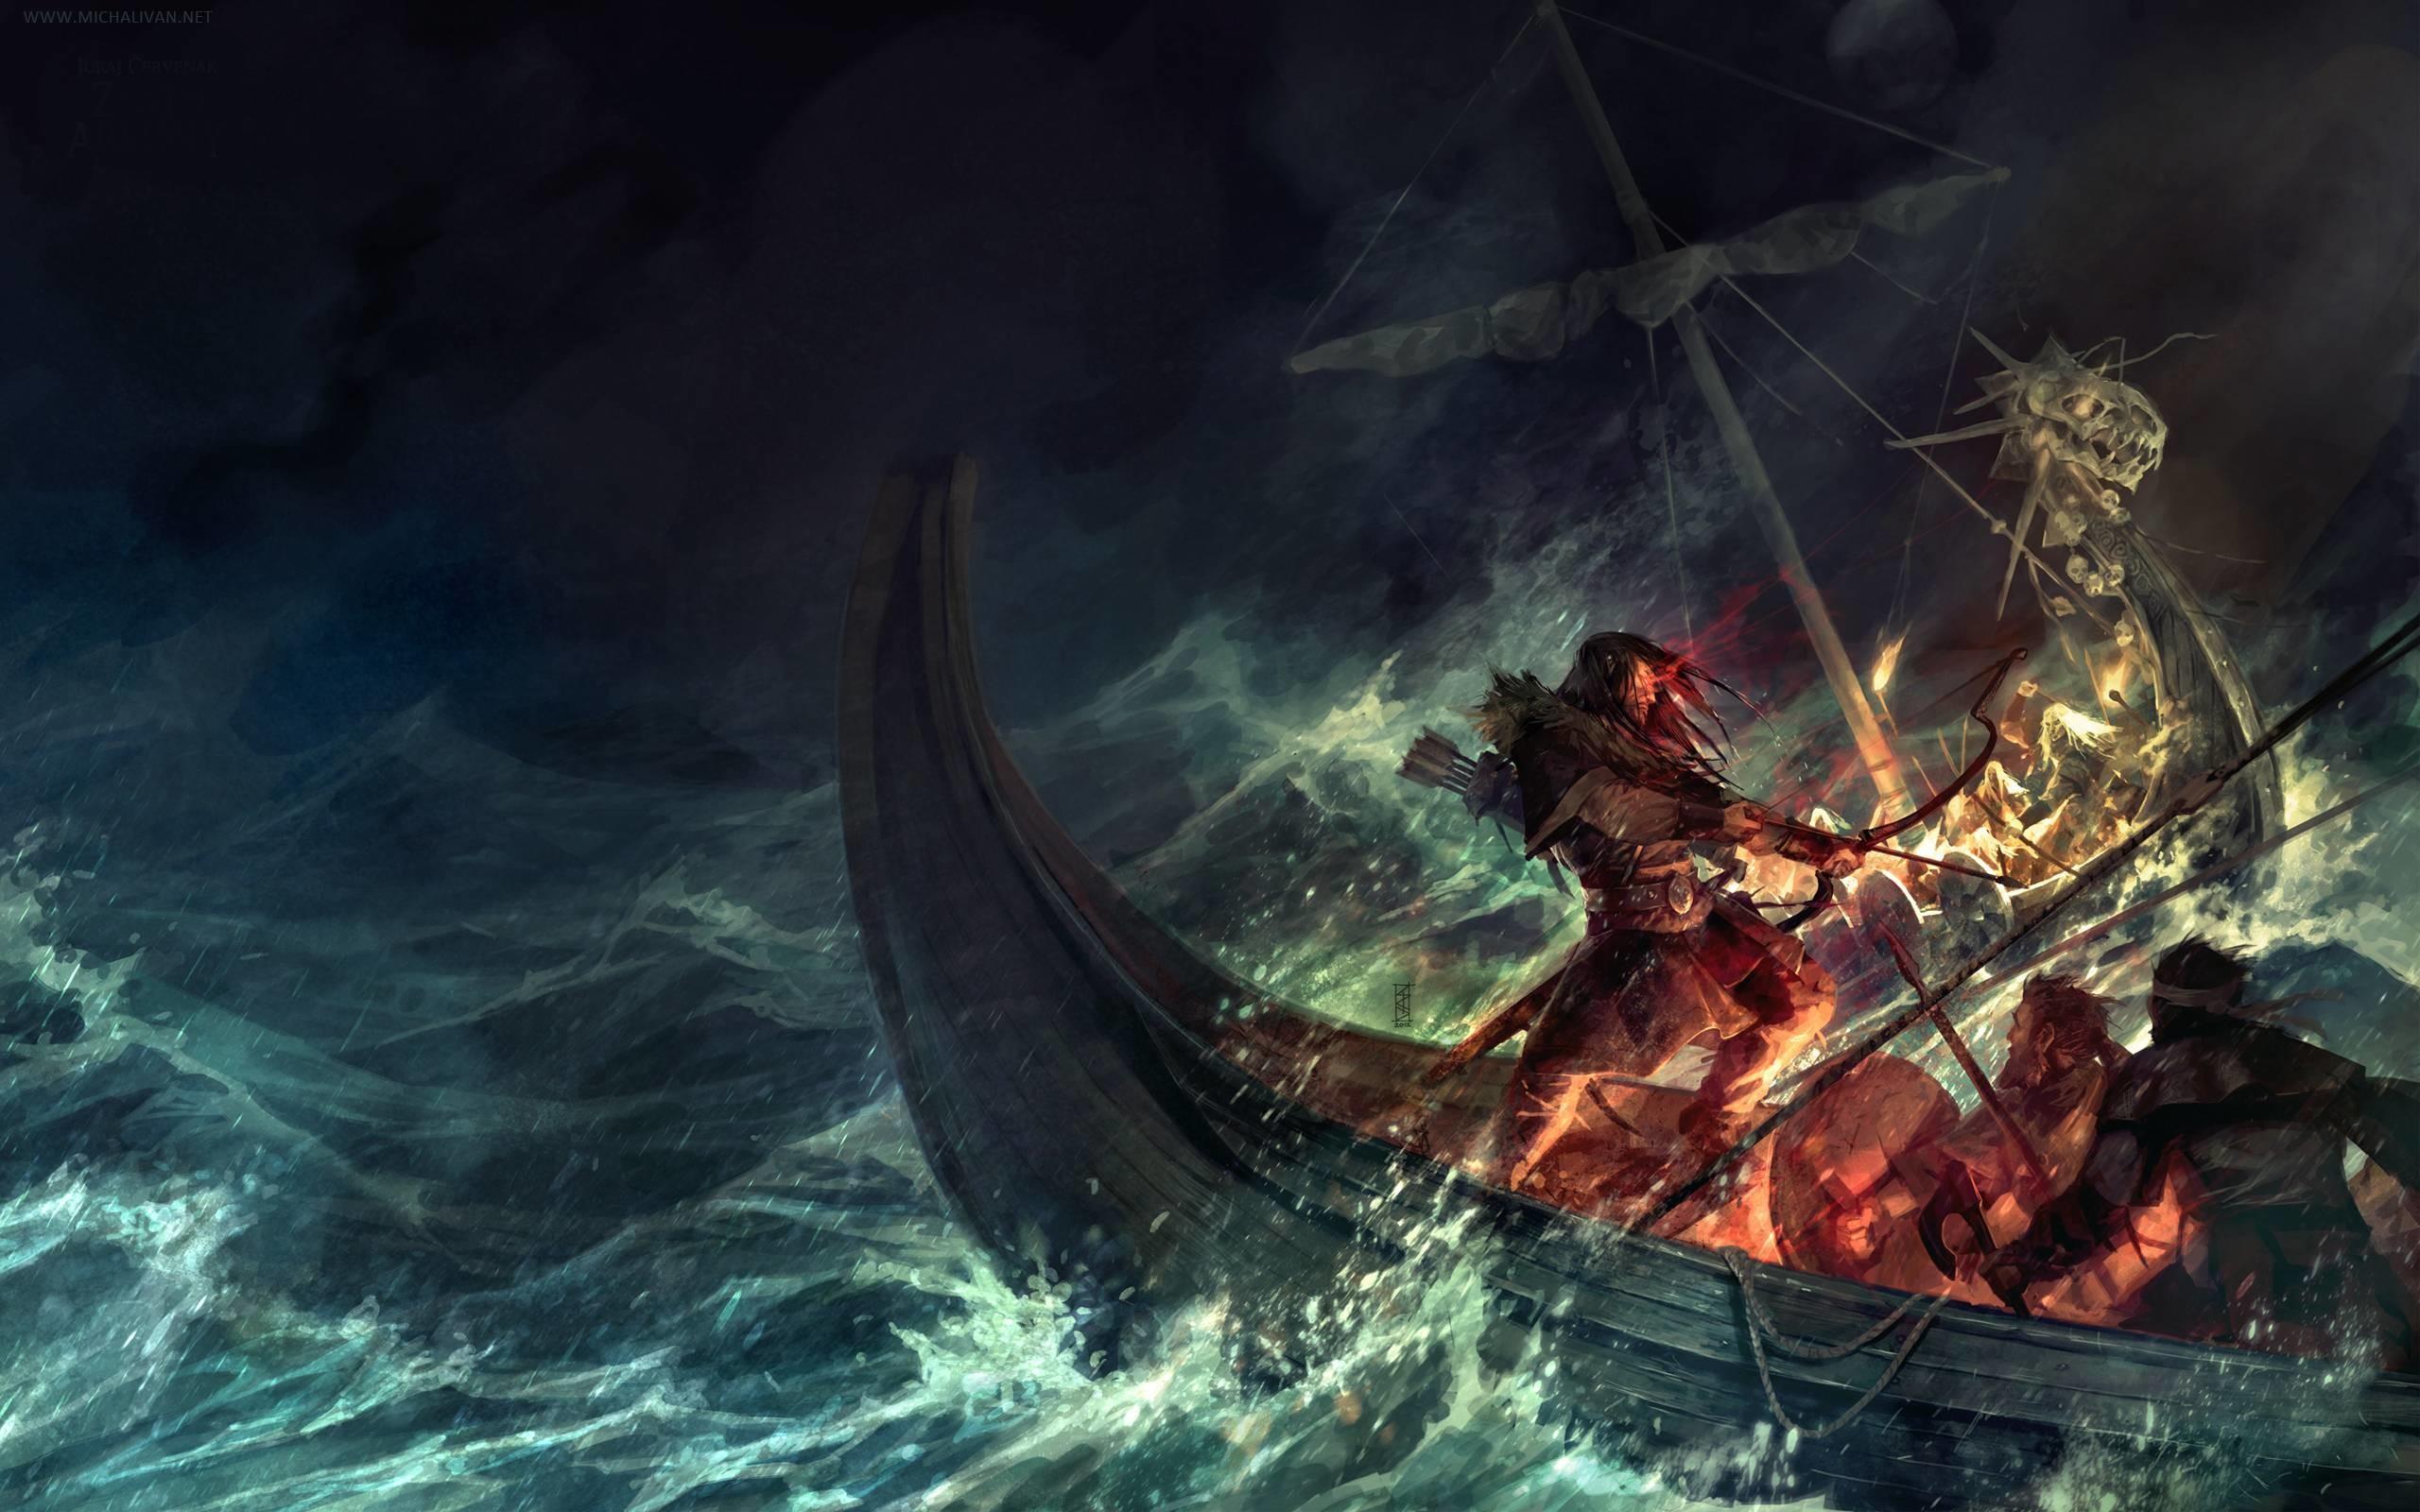 viking wallpaper – 2560×1600 High Definition Wallpaper, Background .